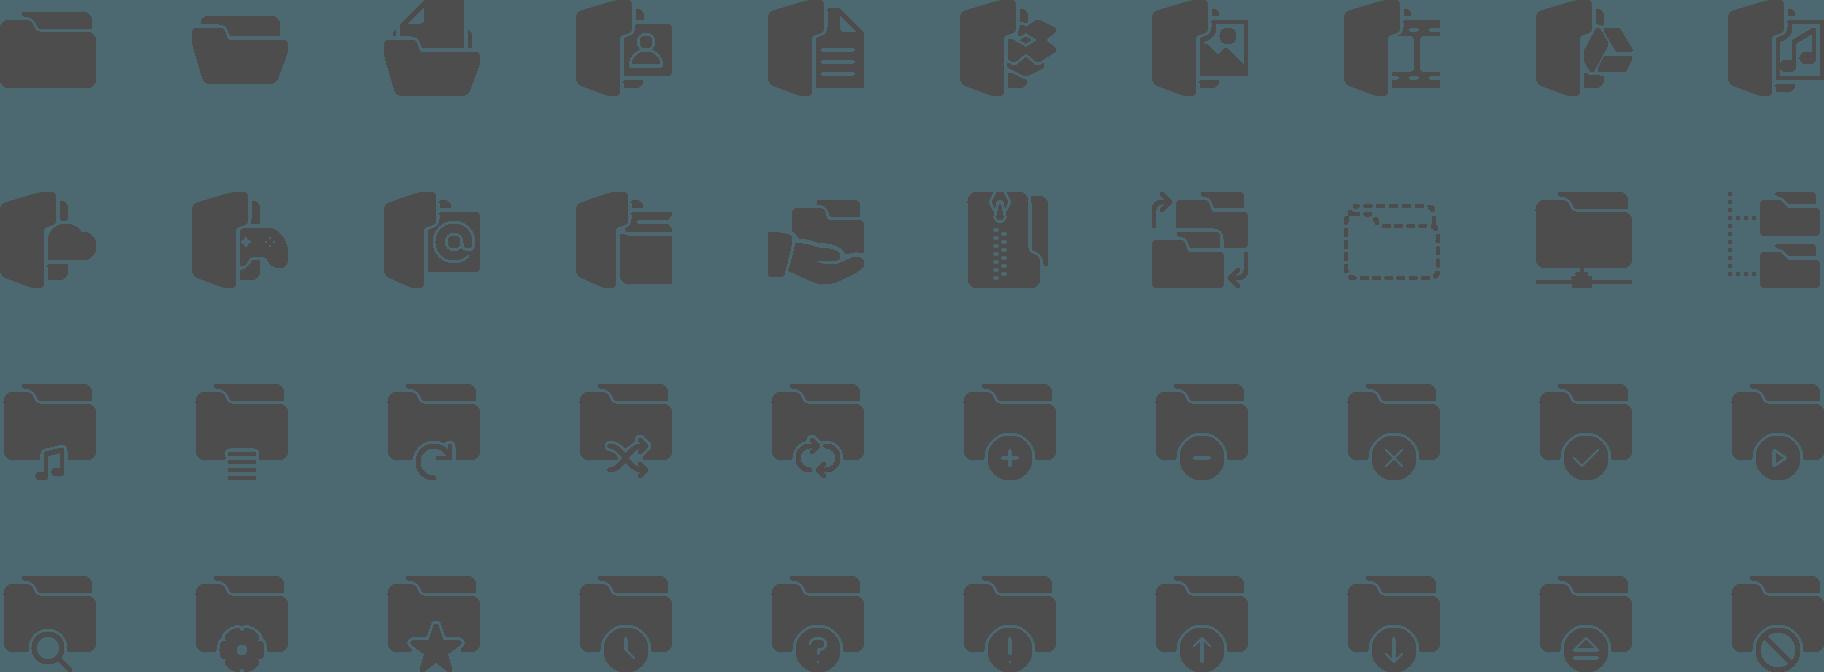 icon Folders